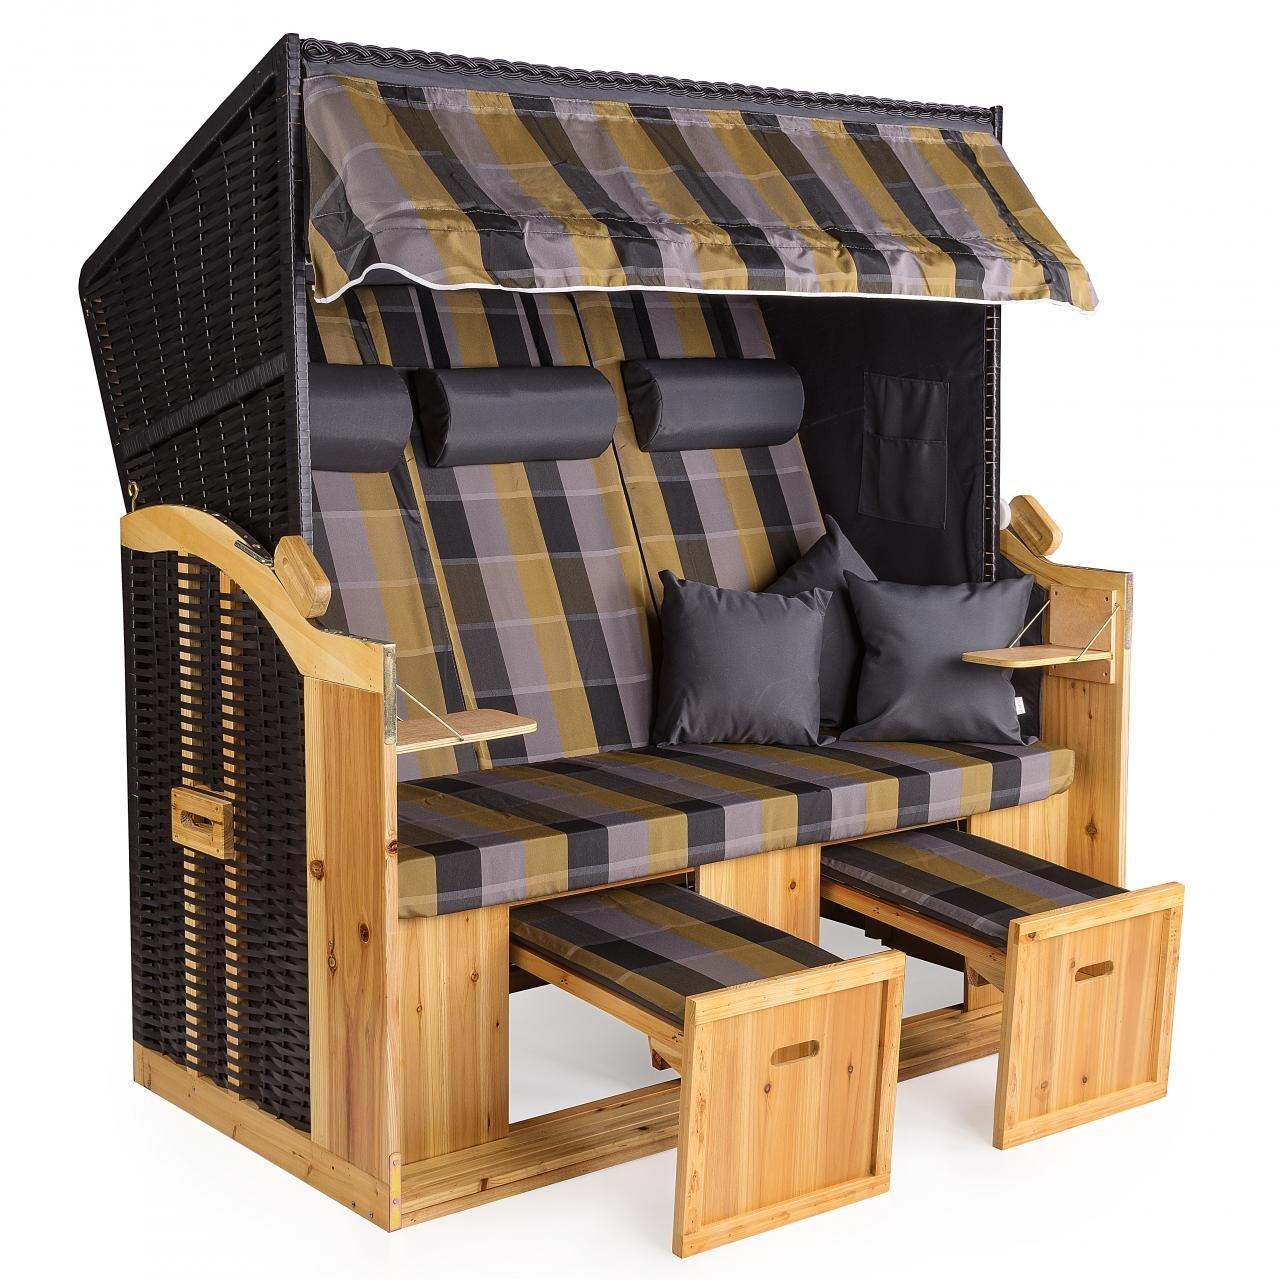 strandkorb deluxe polyrattan sylt ostsee rugbyclubeemland. Black Bedroom Furniture Sets. Home Design Ideas